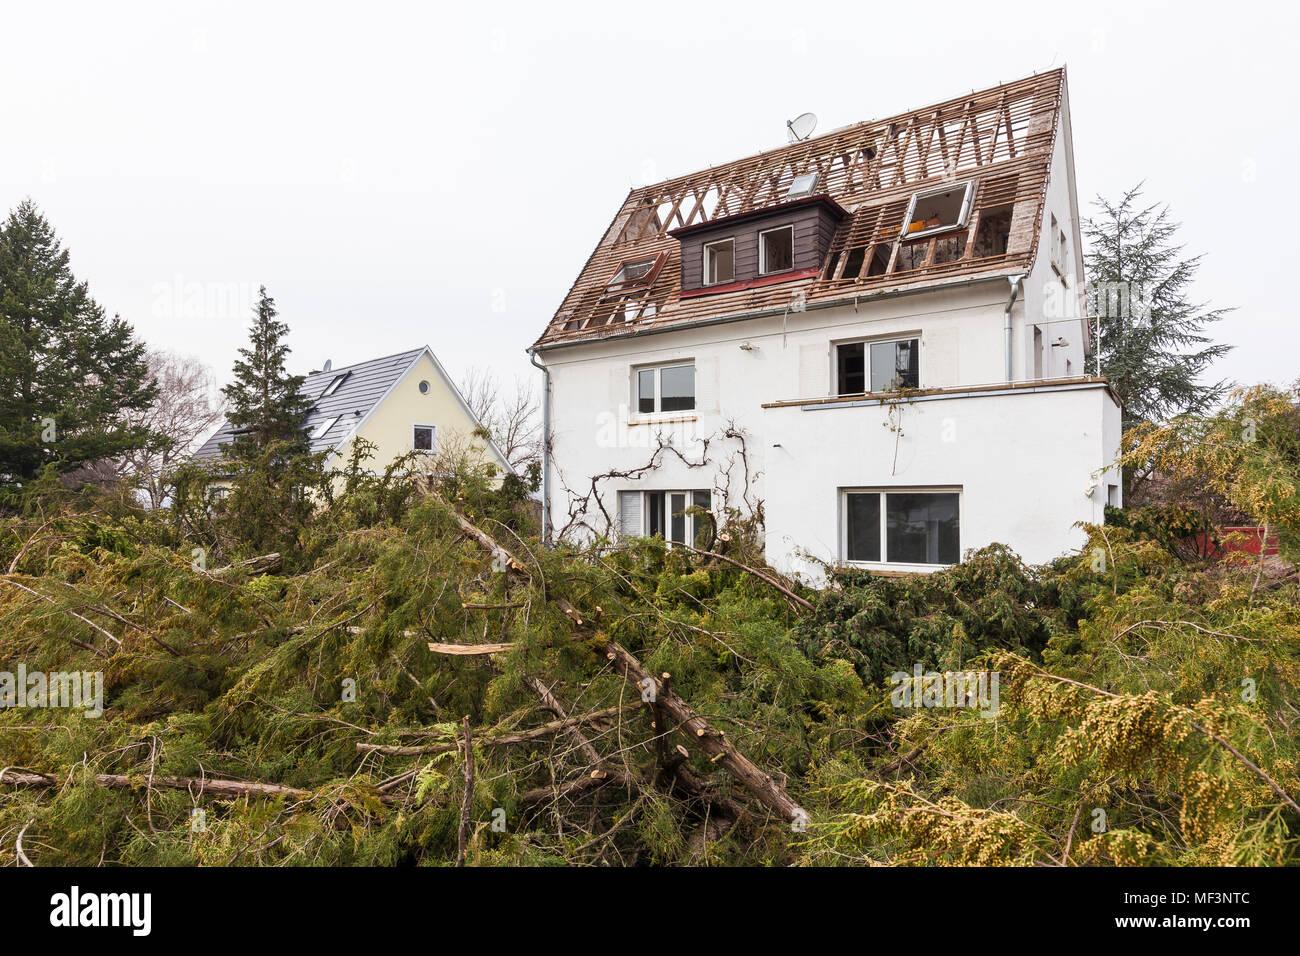 Germany, Stuttgart, demolition of a detached house Stock Photo